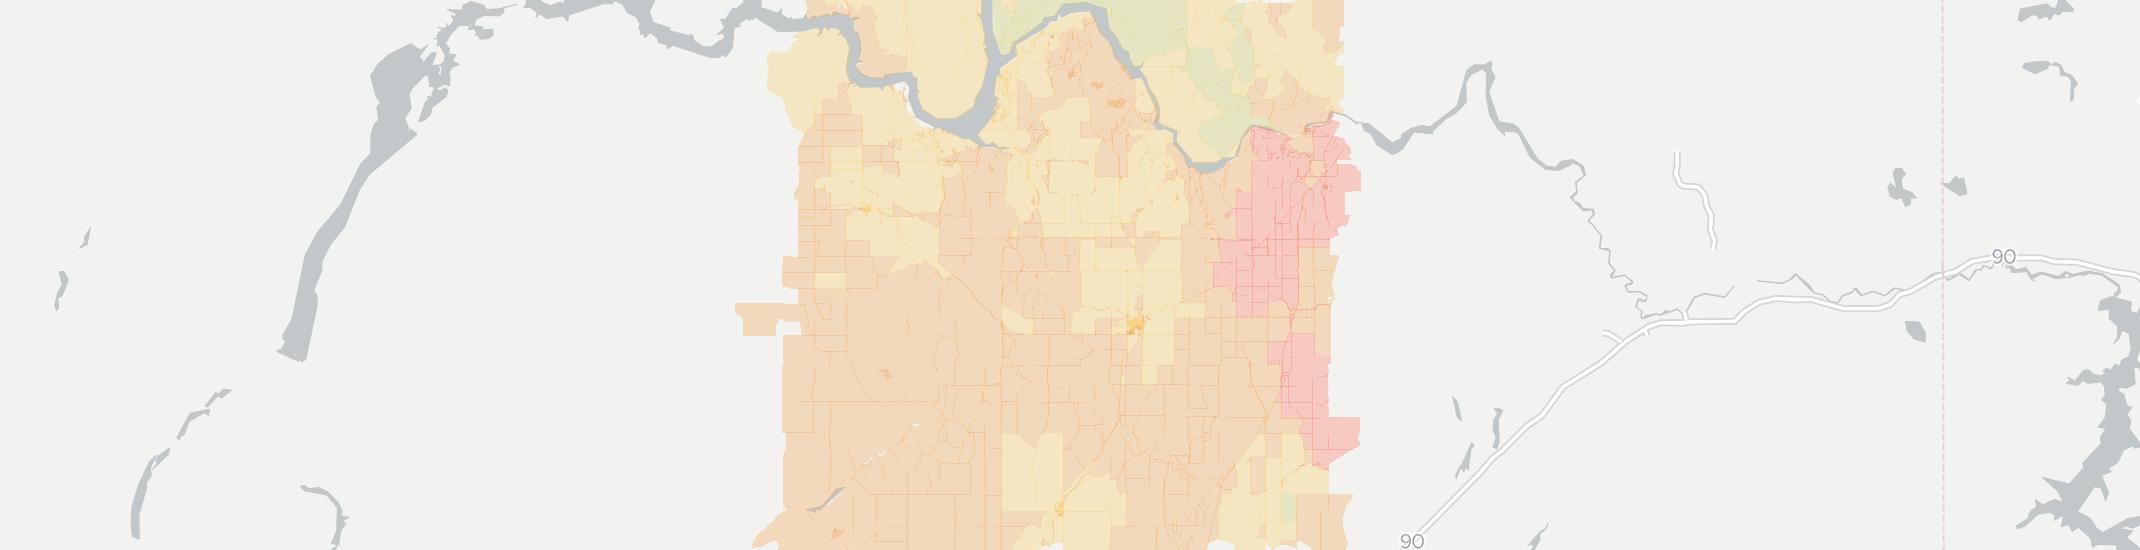 Davenport Washington Map.Internet In Davenport Wa See All 11 Internet Providers